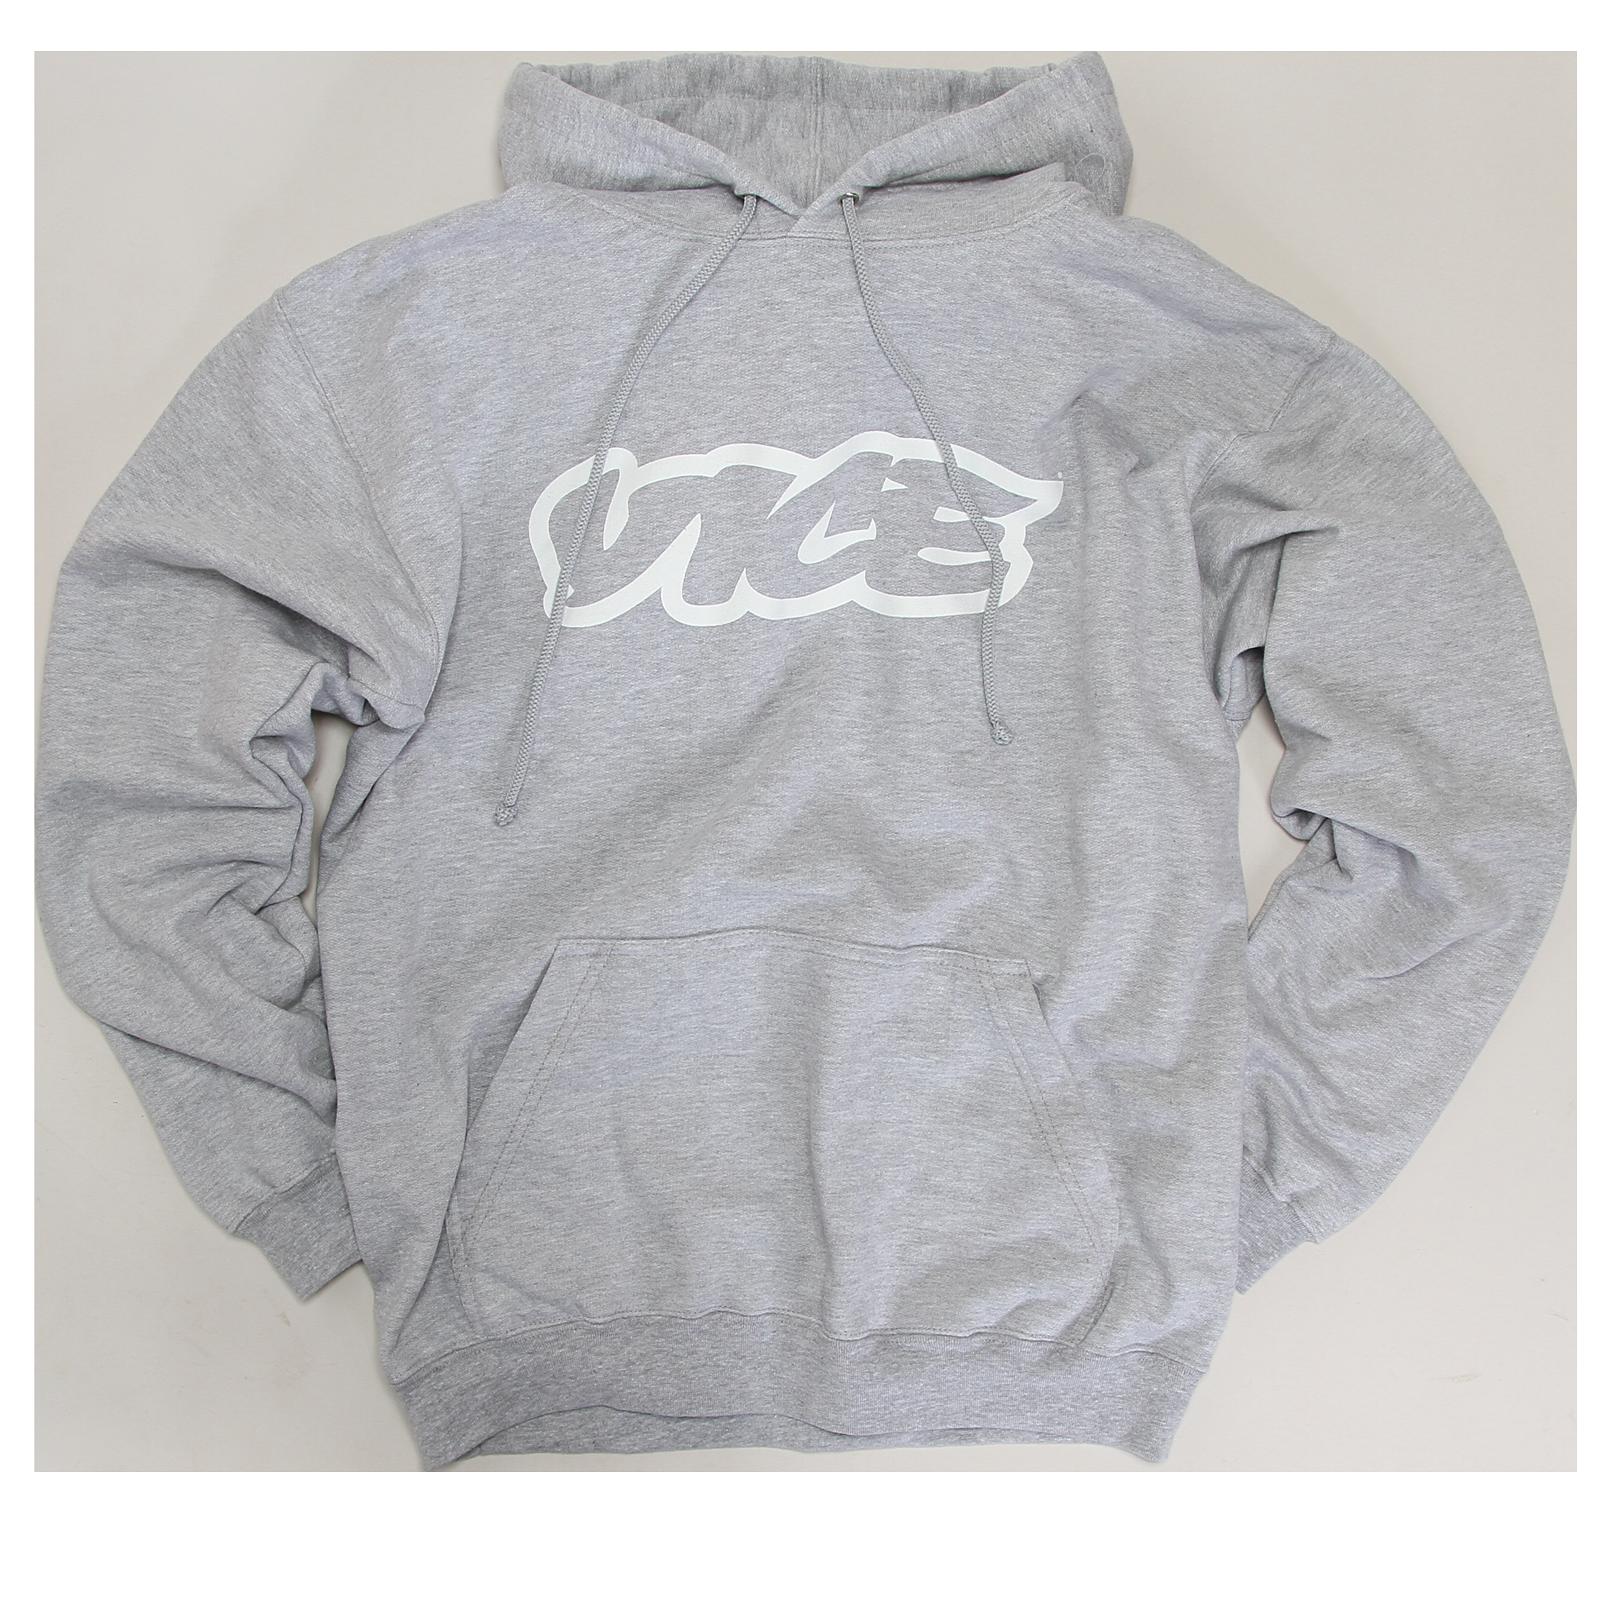 Vice classic canada . Sweatshirt clipart grey hoodie